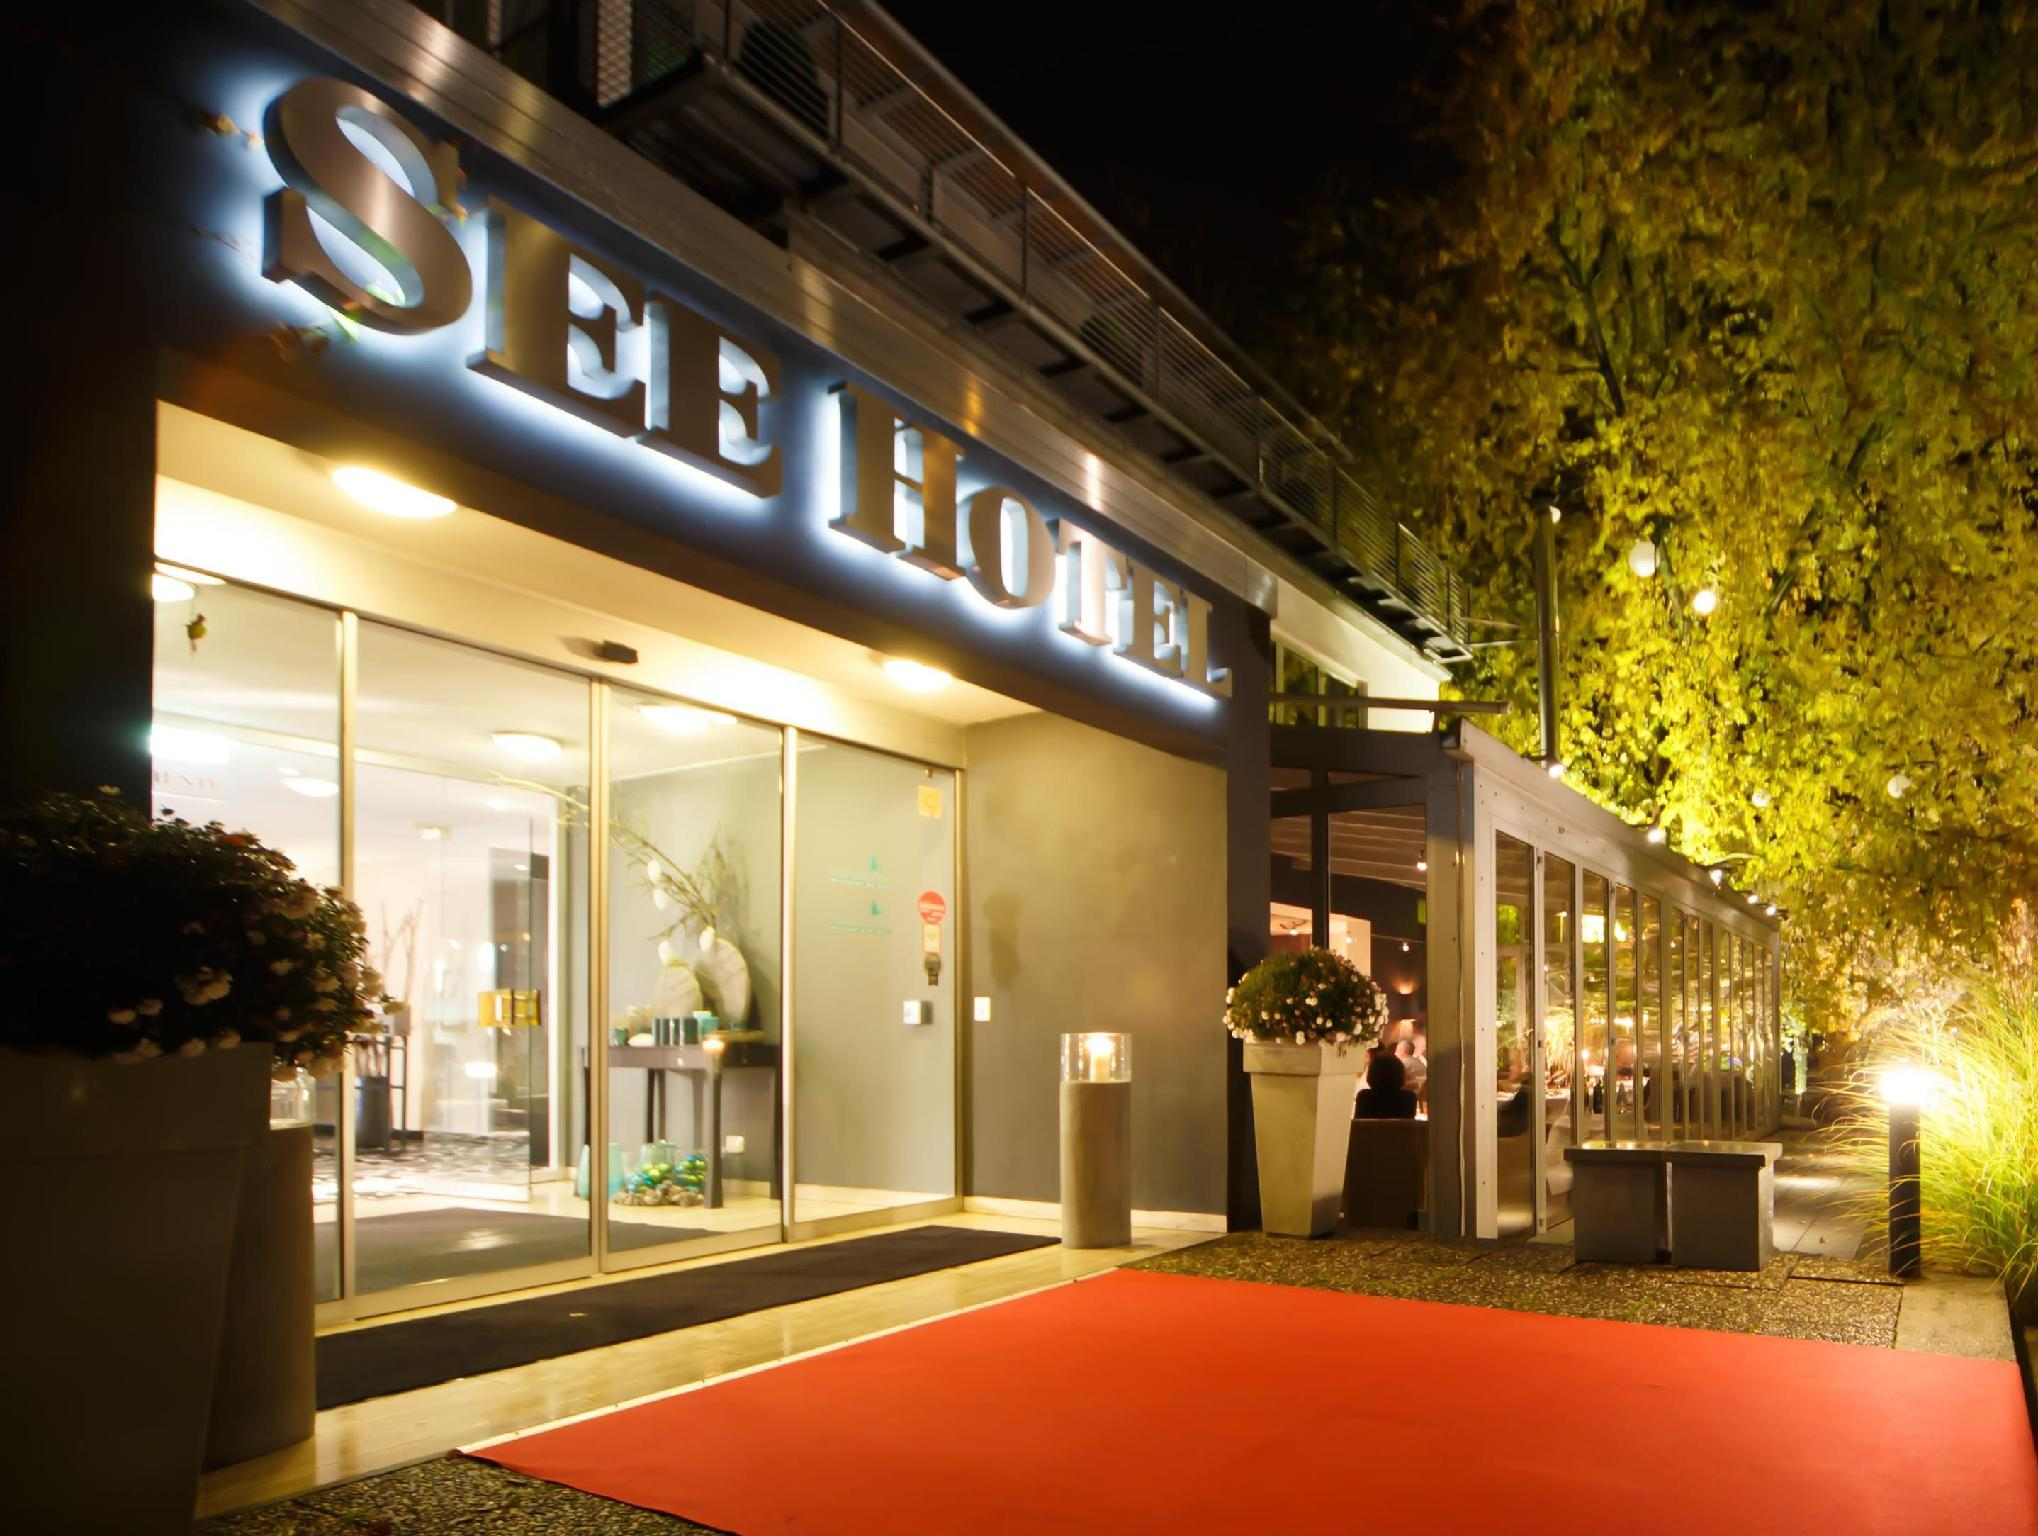 SeeHotel And Restaurant Die Ente